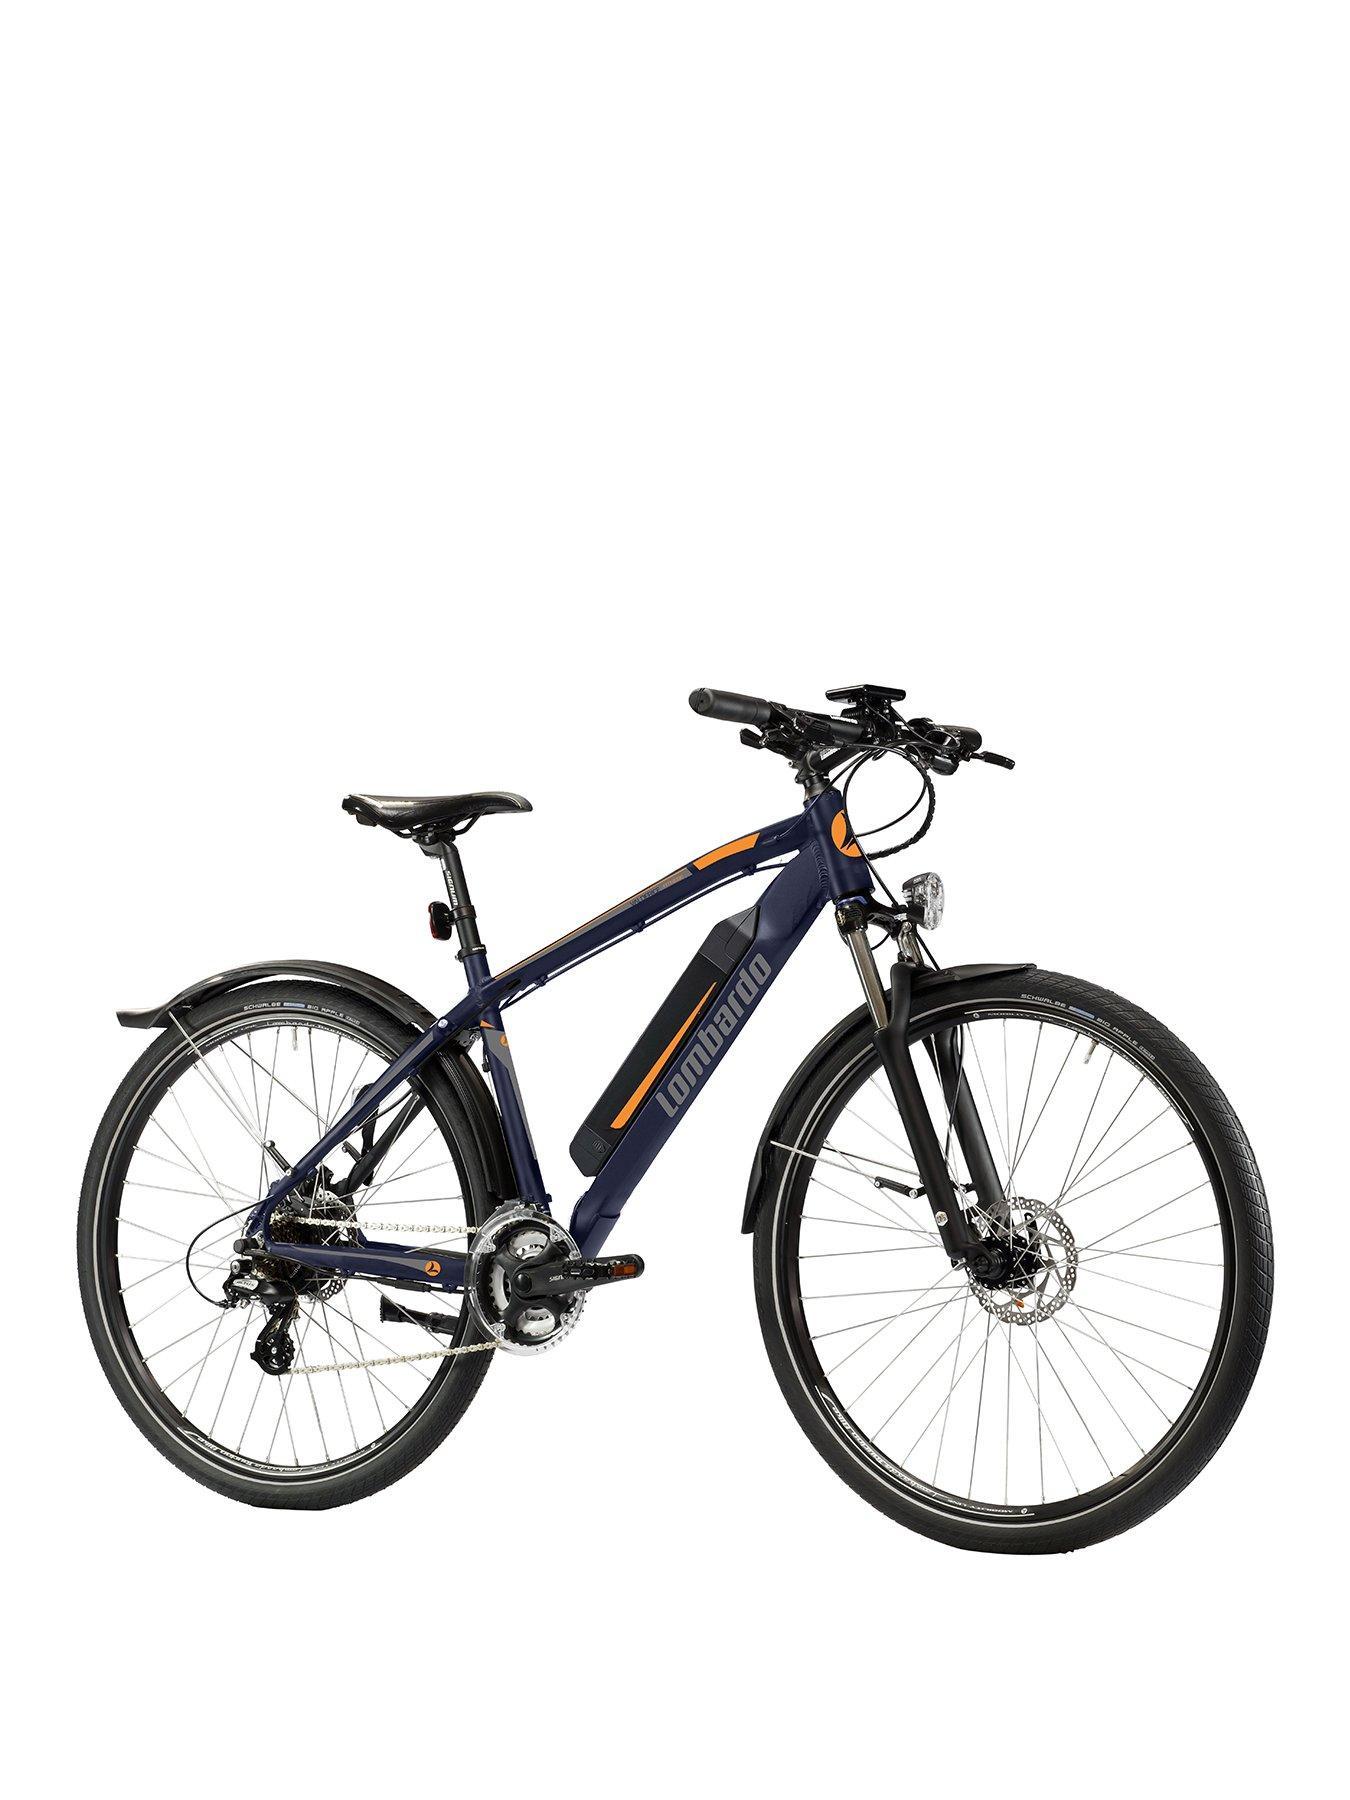 Mountain Bike Cycle Sports Saddle Seat Bicycle Black Sporty MTB Road Foam Padded